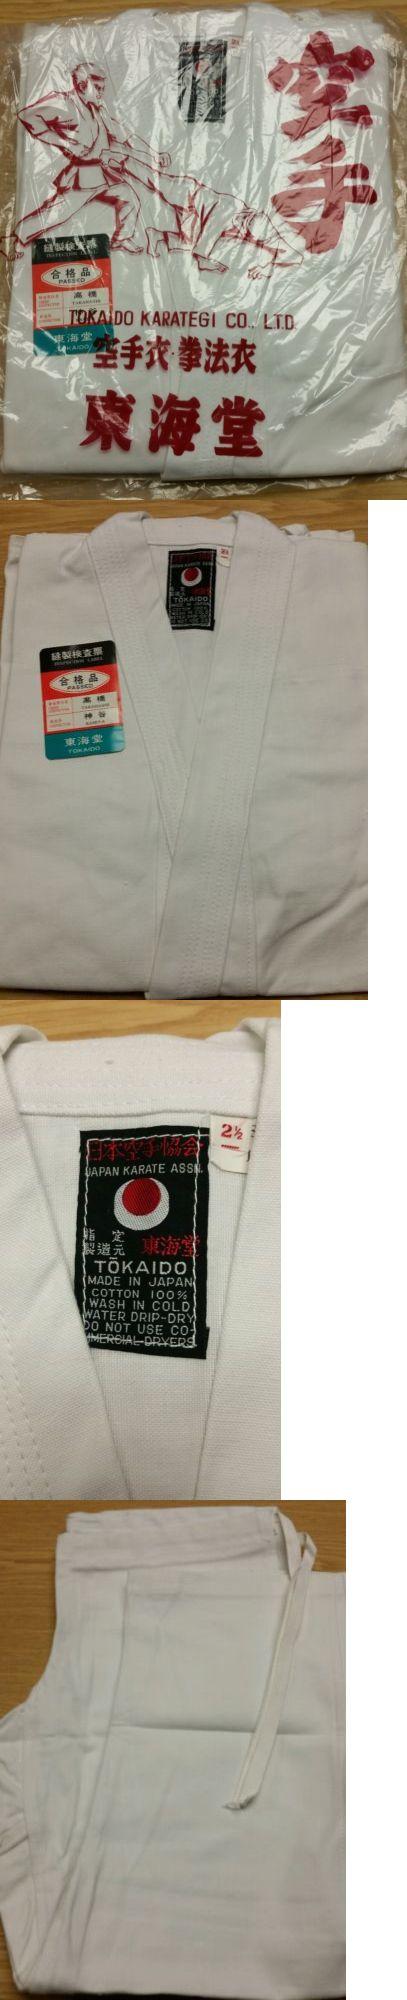 Uniforms and Gis 179774: Tokaido Karate Gi (White) Size 2 1/2 -> BUY IT NOW ONLY: $75.0 on eBay!